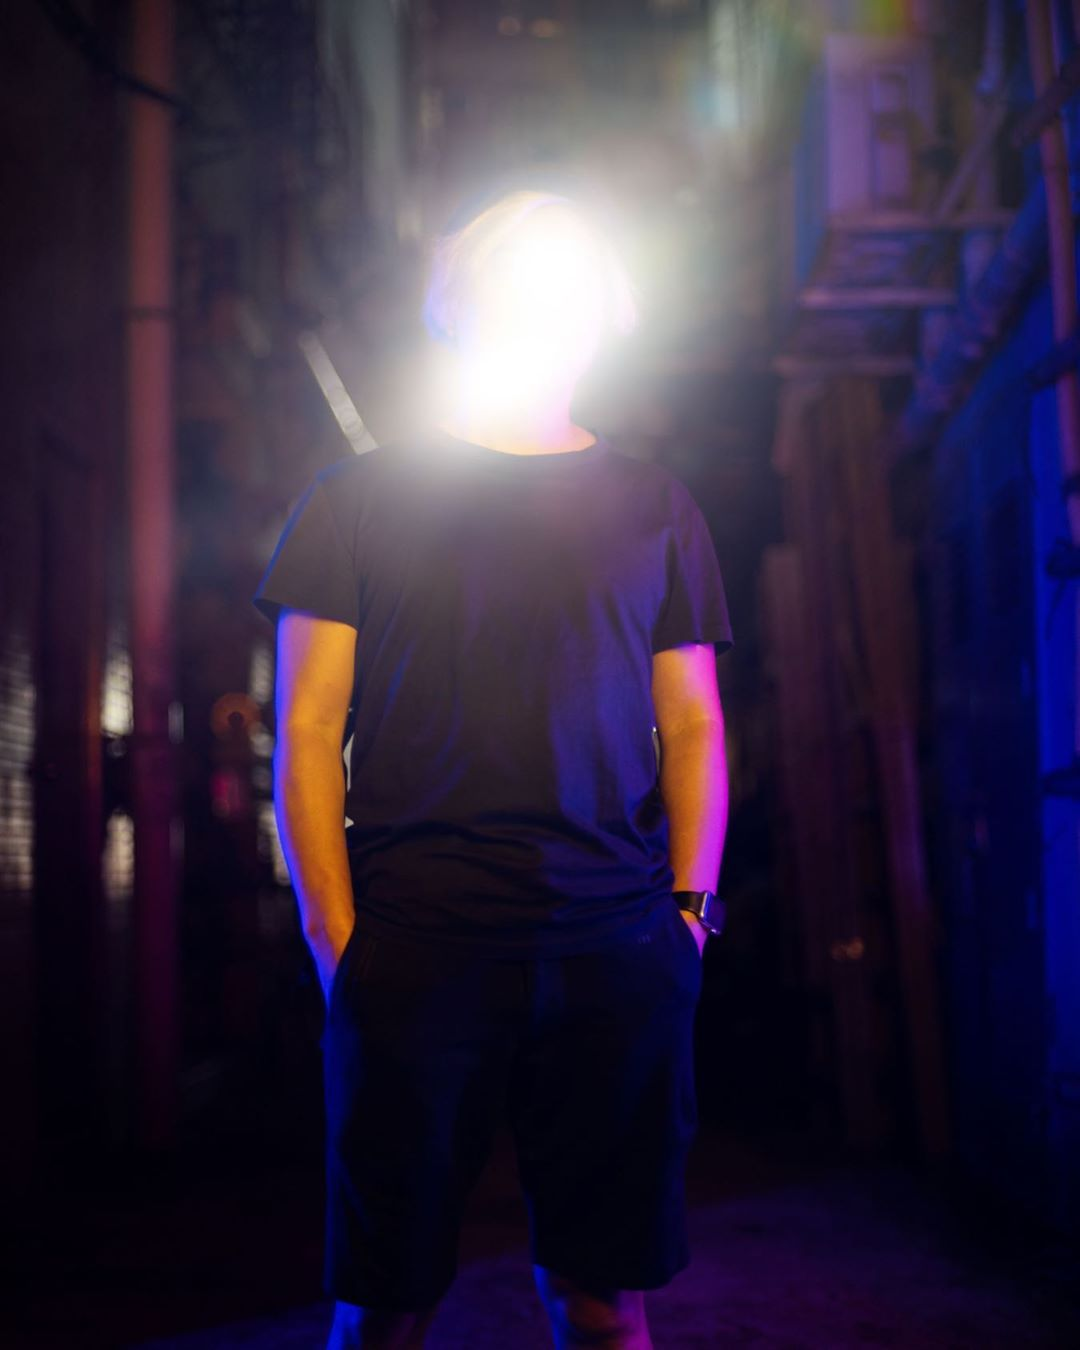 illuminate hk china extradition